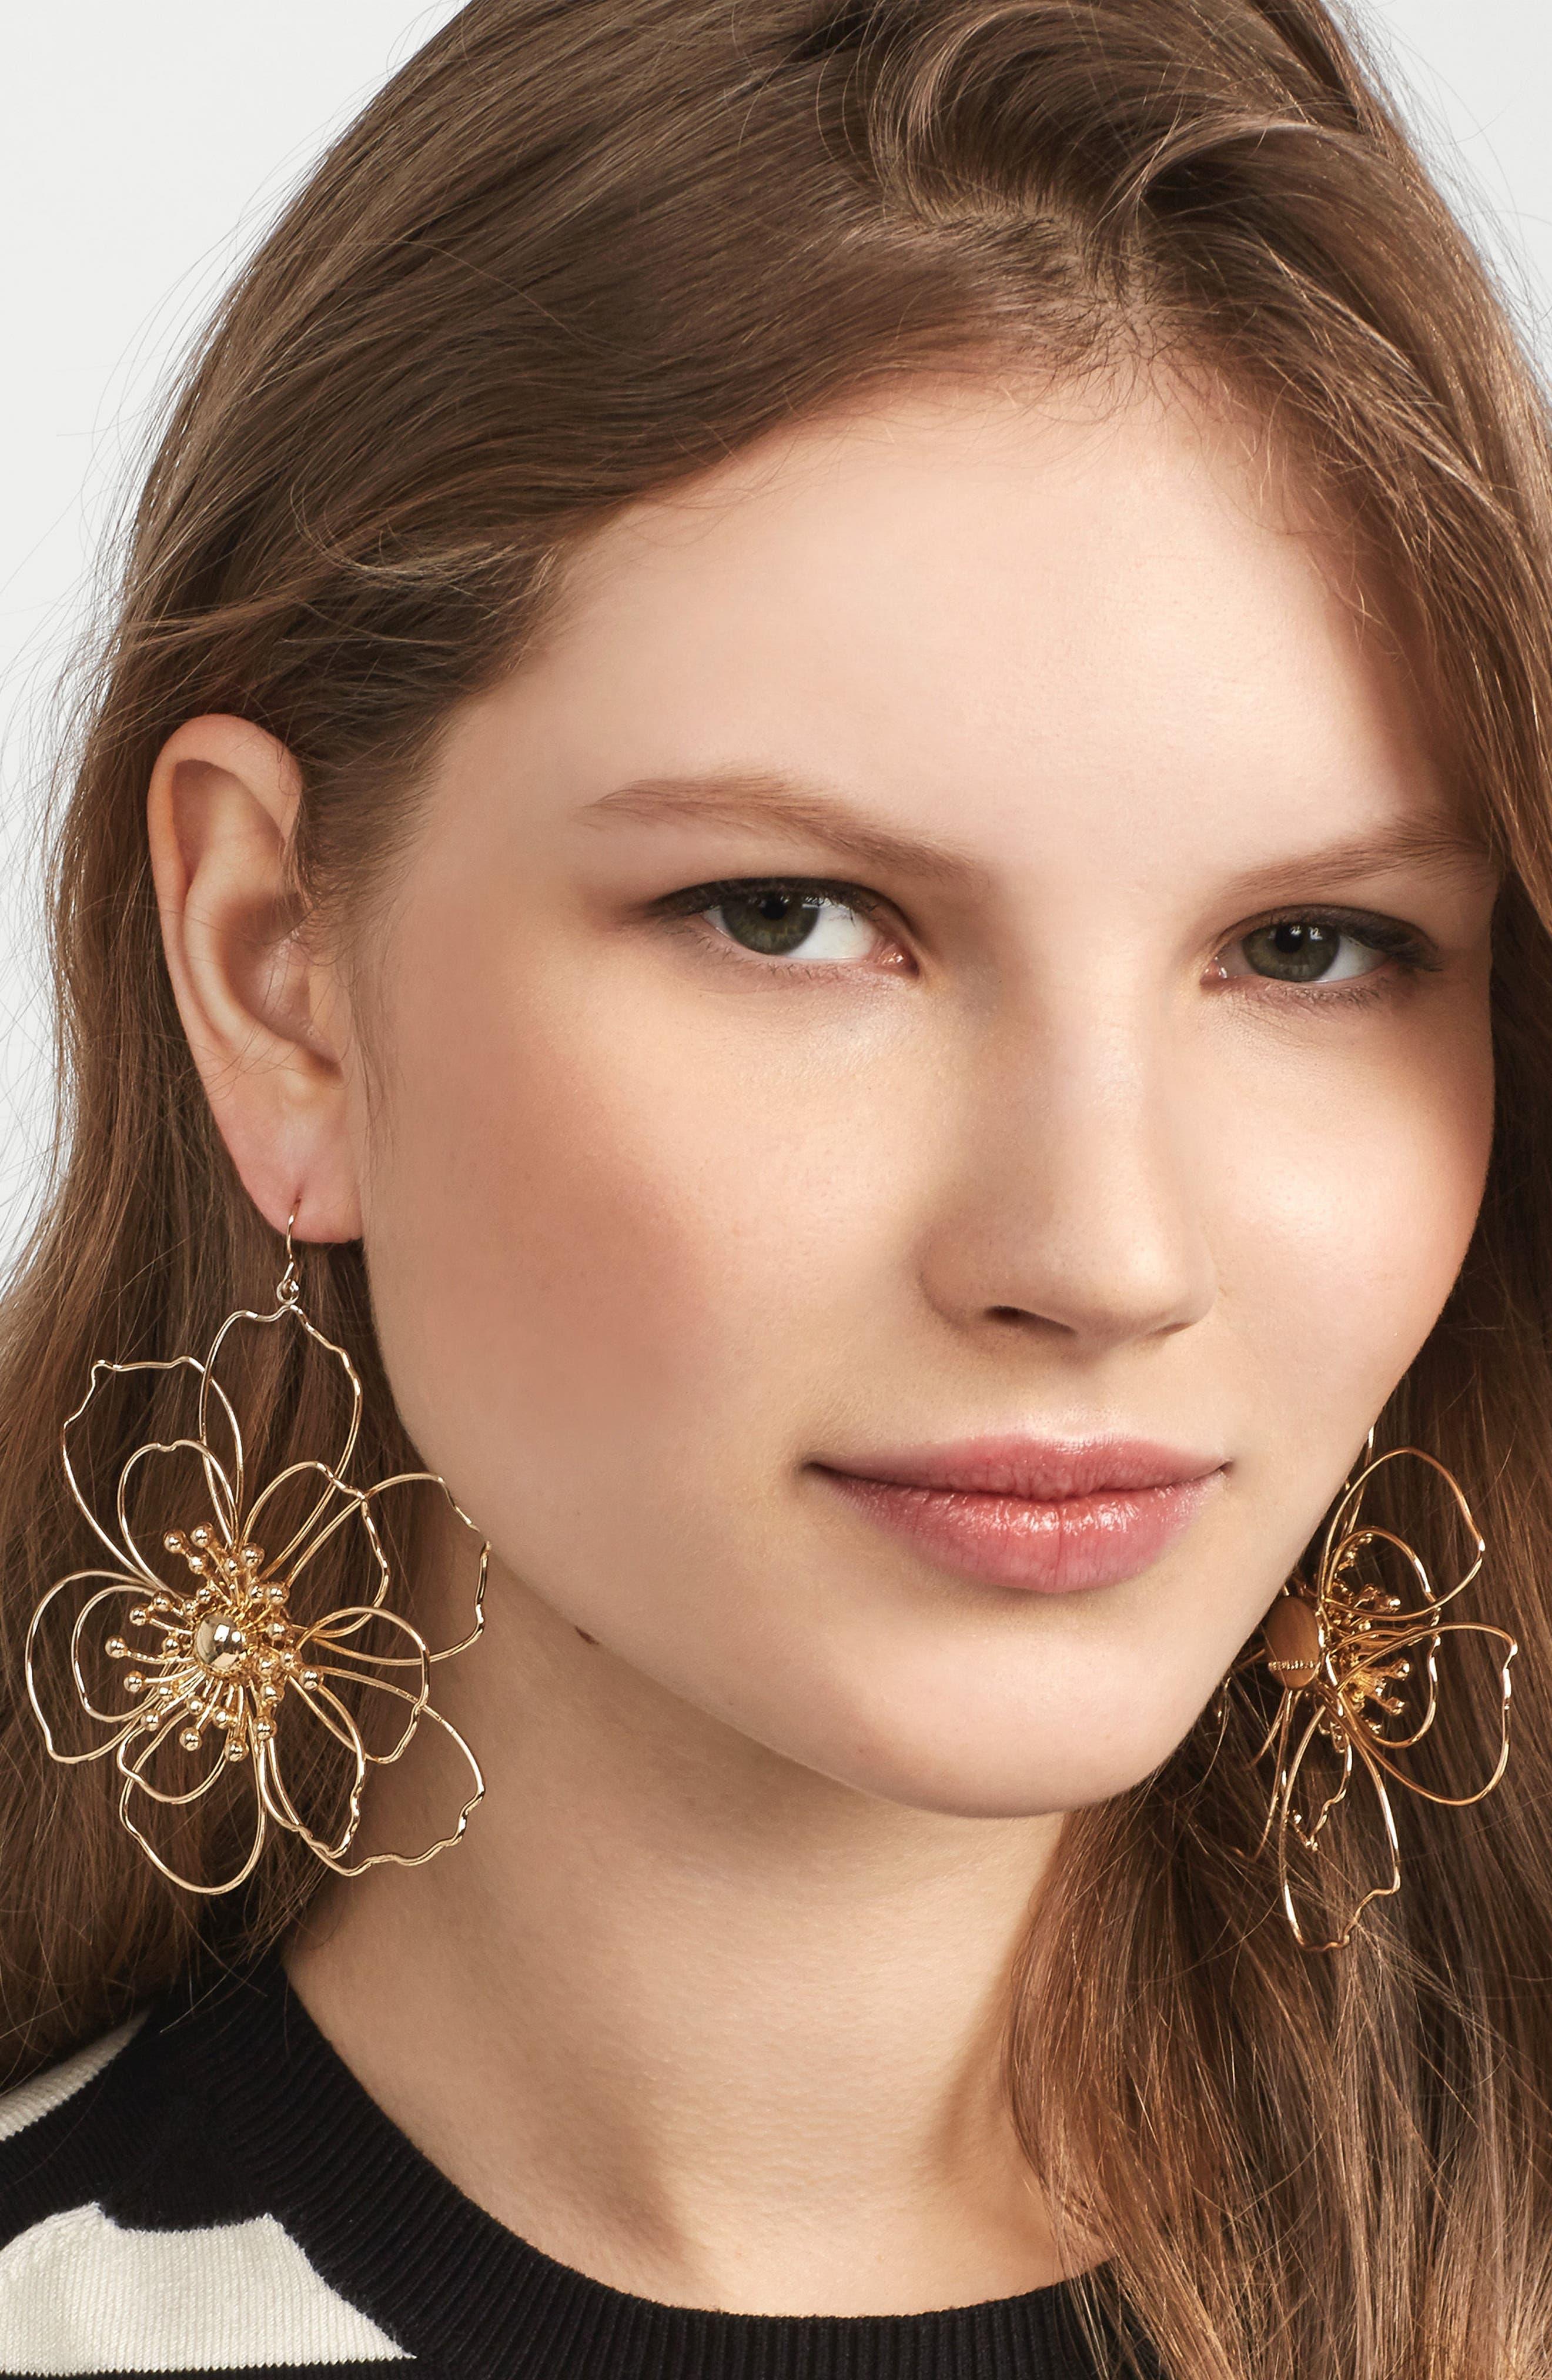 Blossom Drop Earrings,                             Alternate thumbnail 2, color,                             710